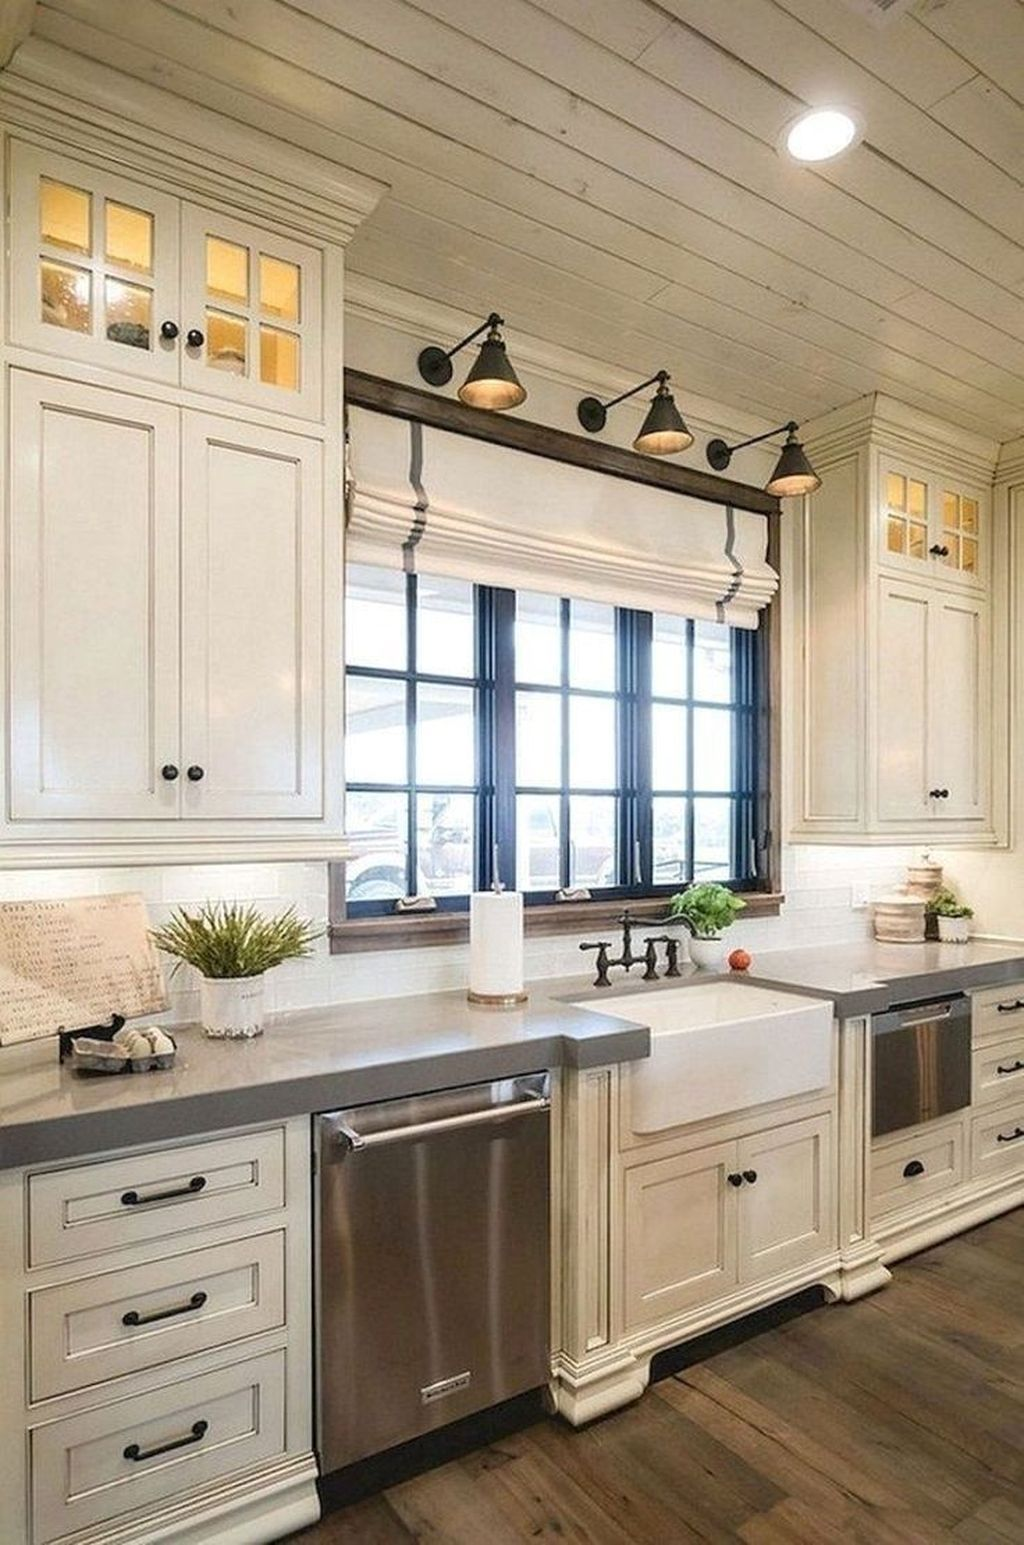 50 Amazing Remodeling Farmhouse Kitchen Decorations - SWEETYHOMEE #farmhousekitchencountertops